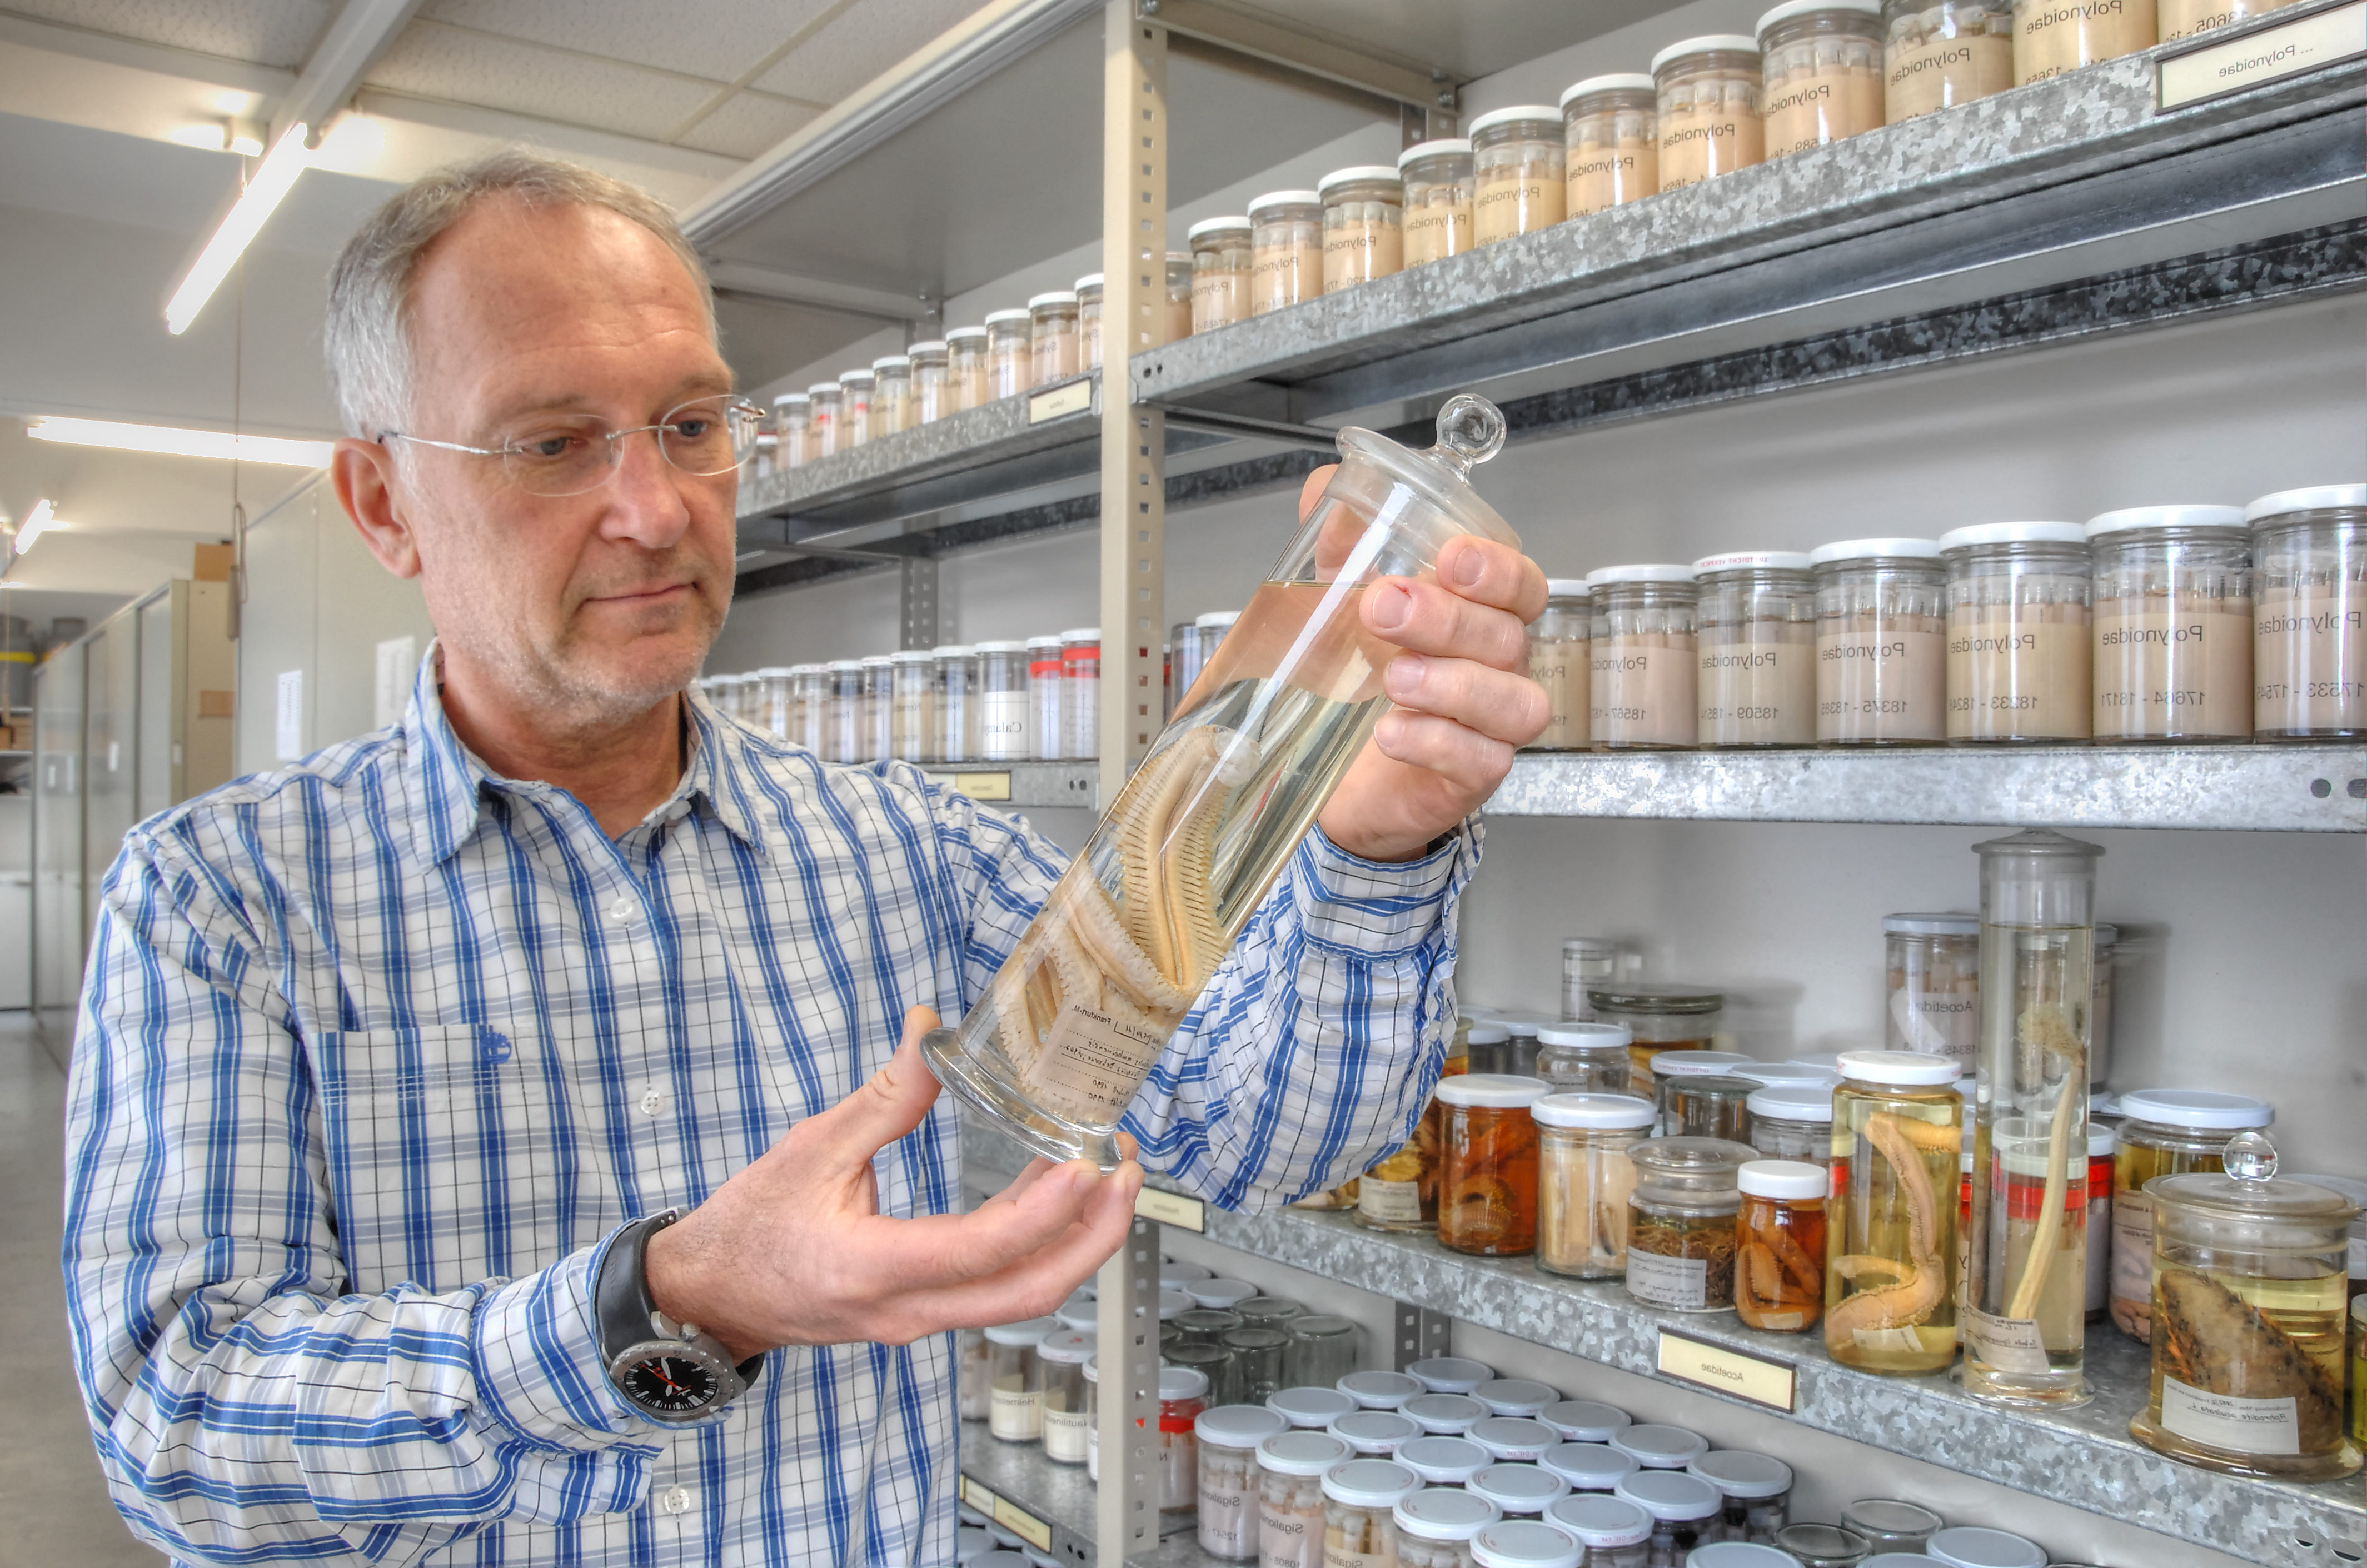 Sammlung Polycheaten Dr. Dieter Fiege